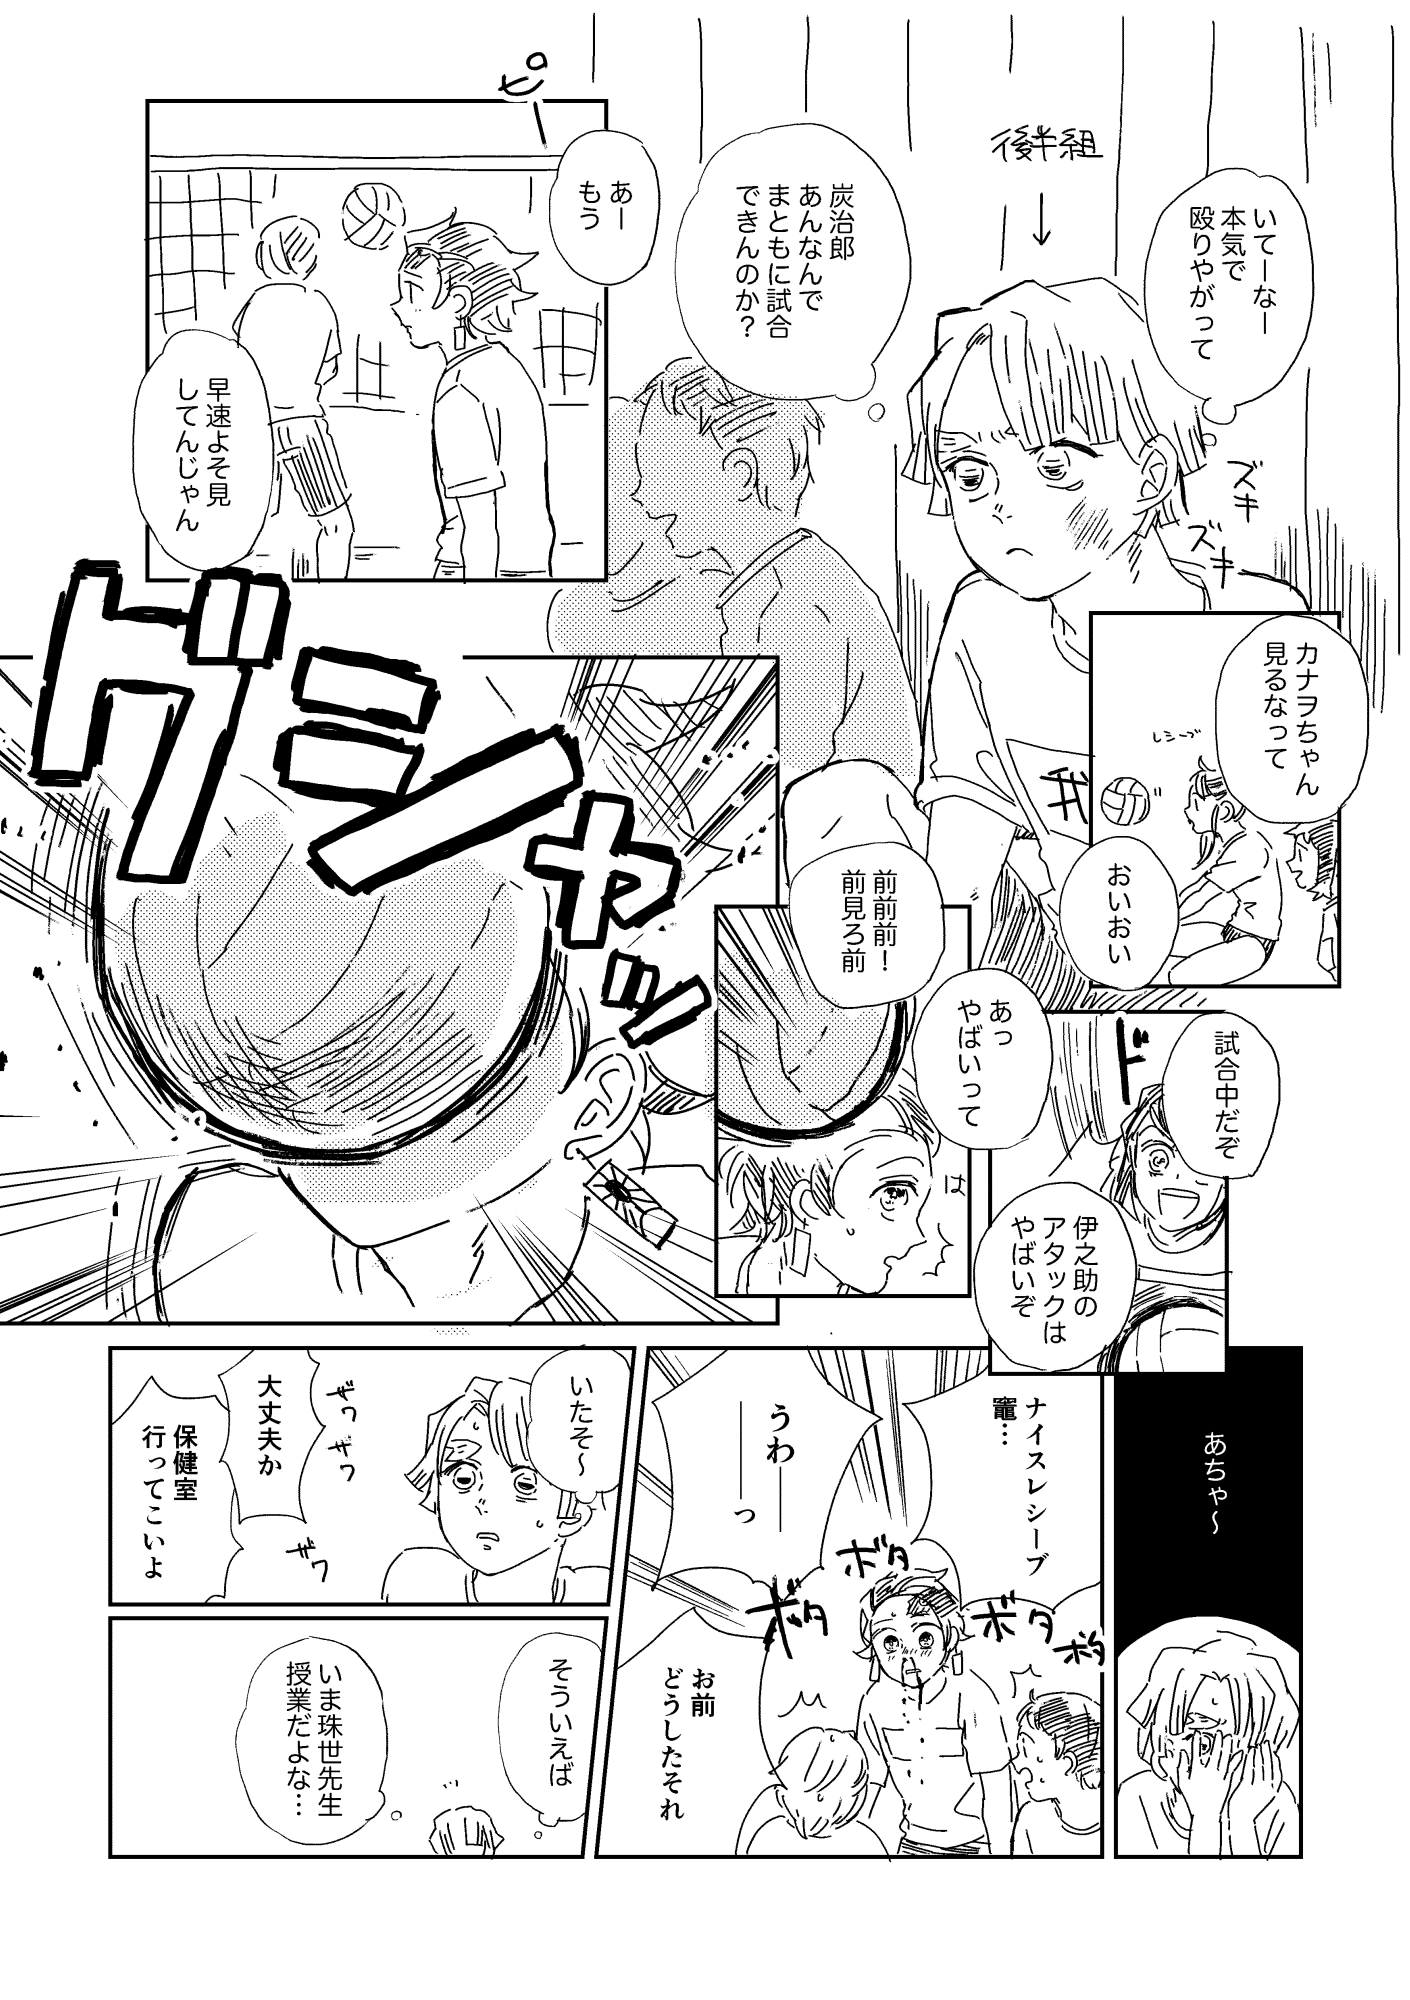 twitter 漫画 ヤキモチ カナエ